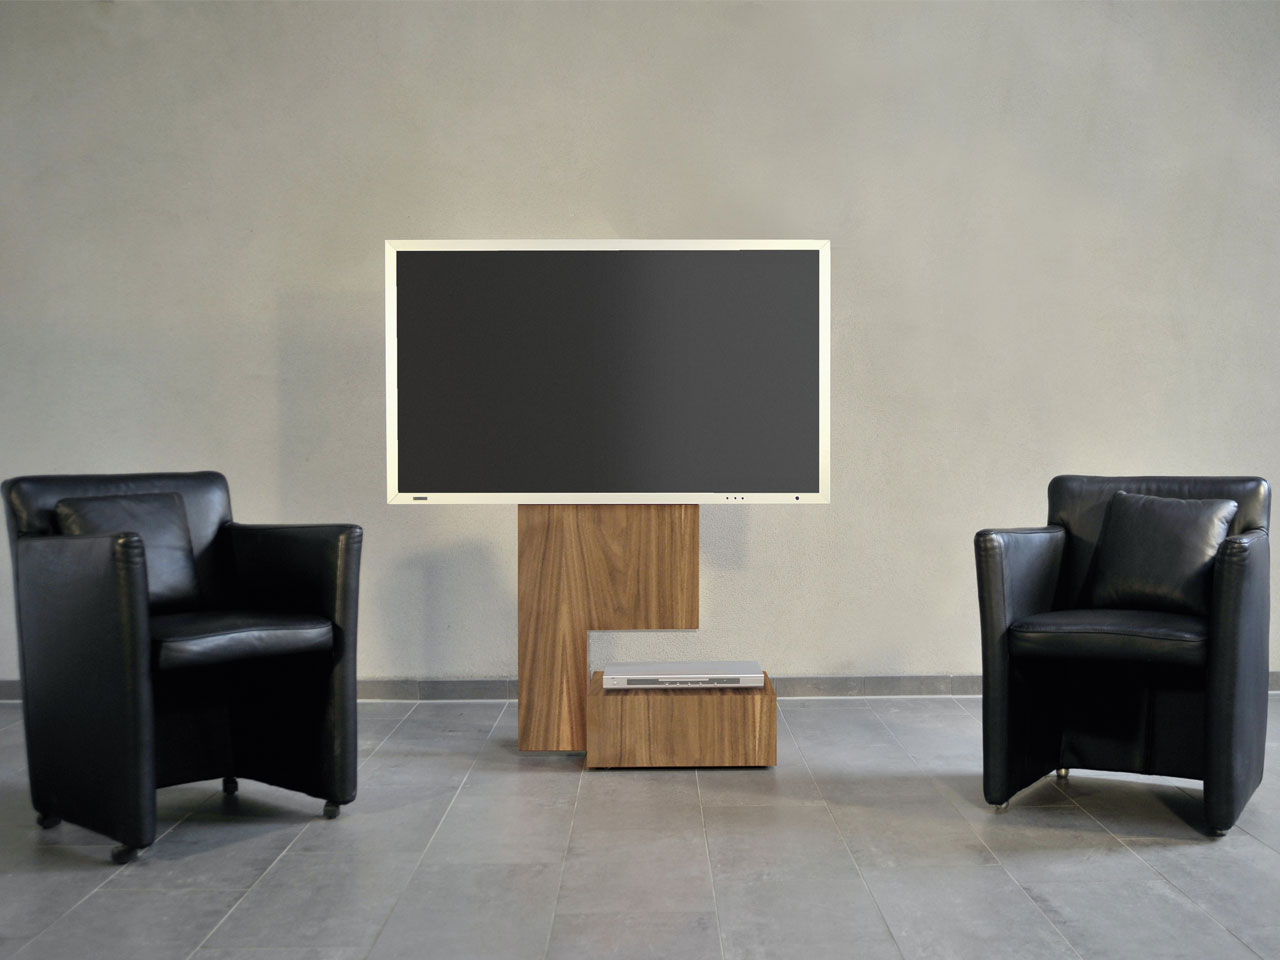 wissmann tv halter move art115 g nstig kaufen cmb systeme. Black Bedroom Furniture Sets. Home Design Ideas